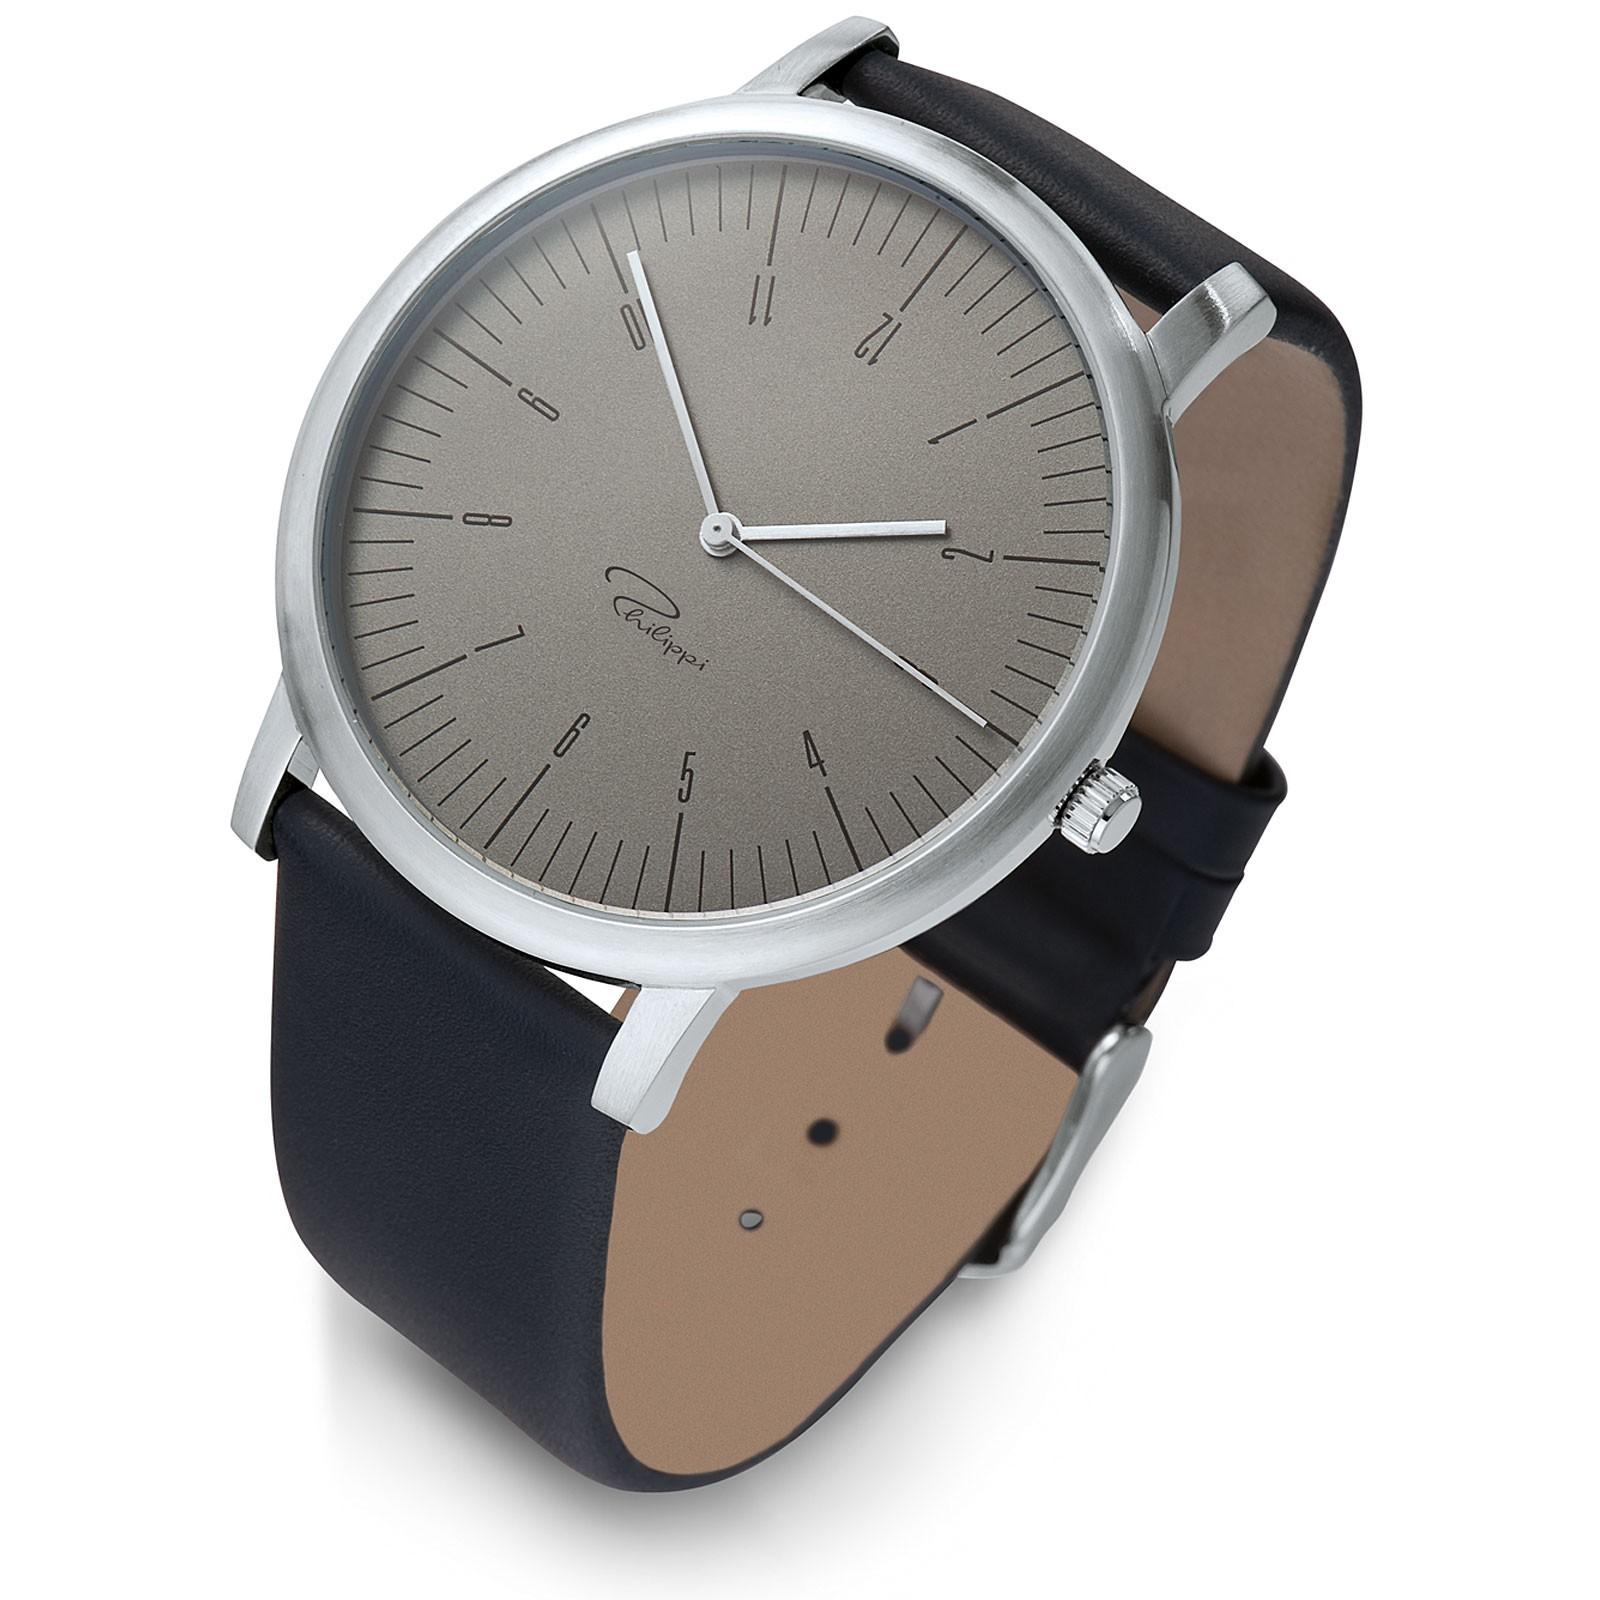 Armbanduhr Uhr MG1 Leder Philippi TEMPUS